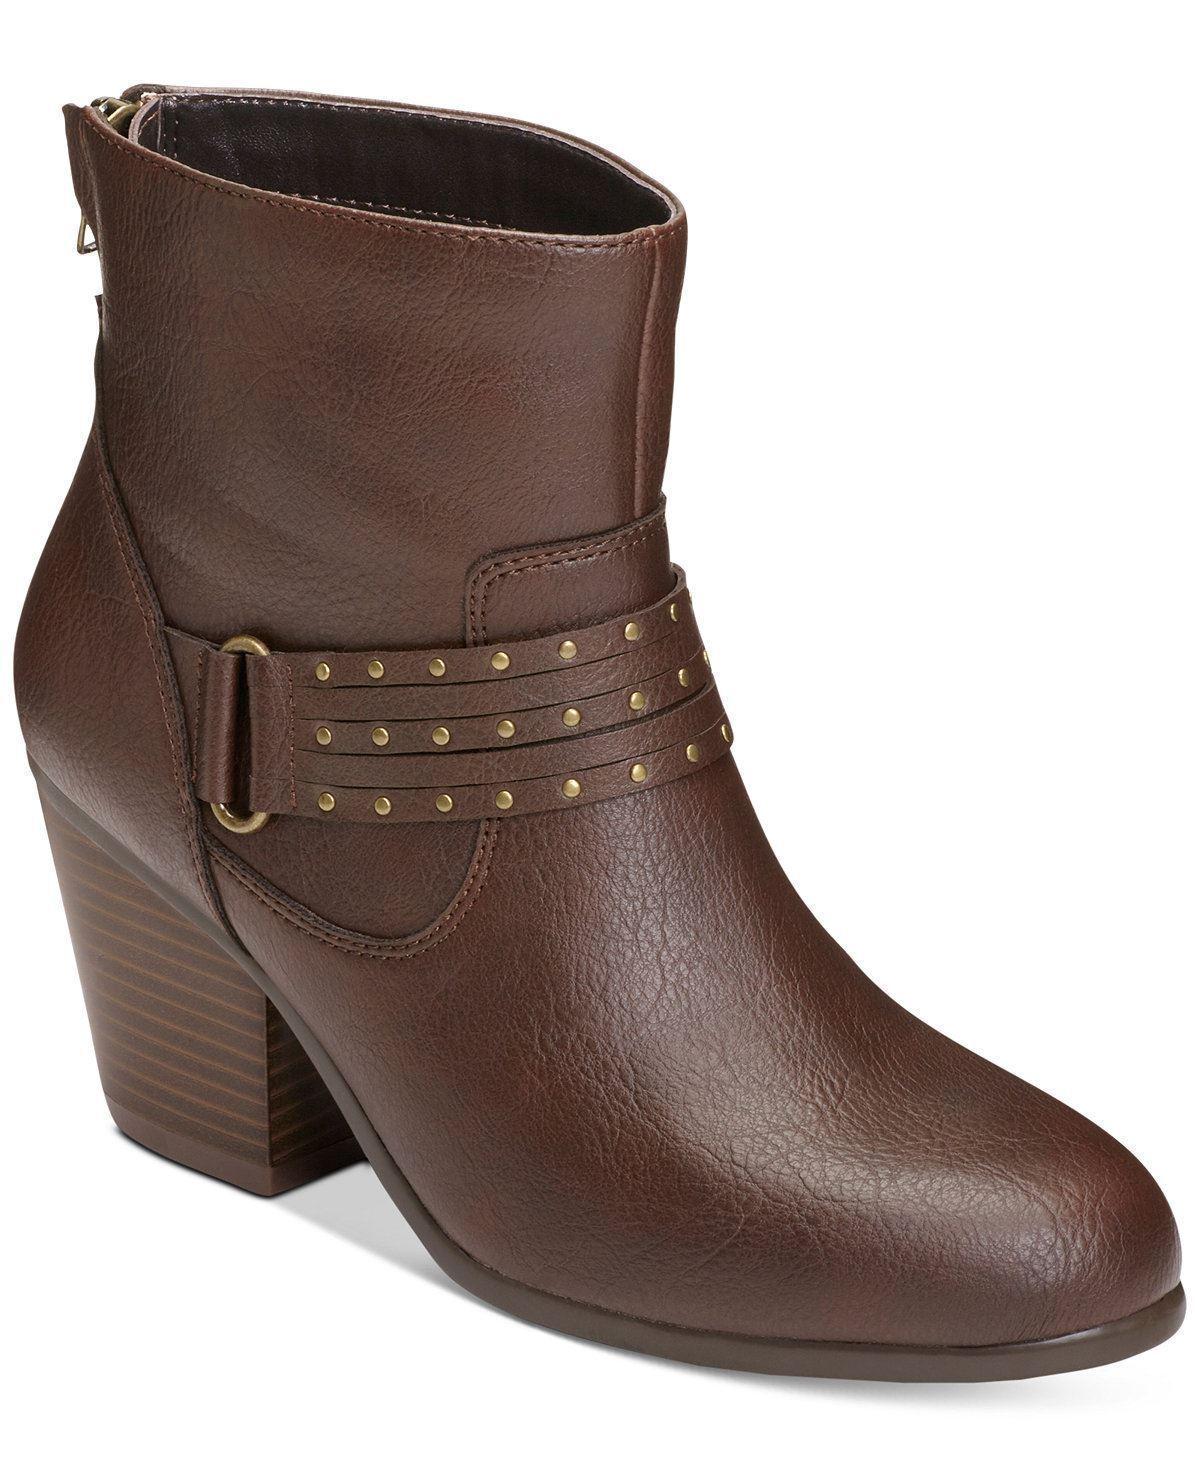 Aerosoles Longevity Brown Mid Shaft Boots Brown Size 5M